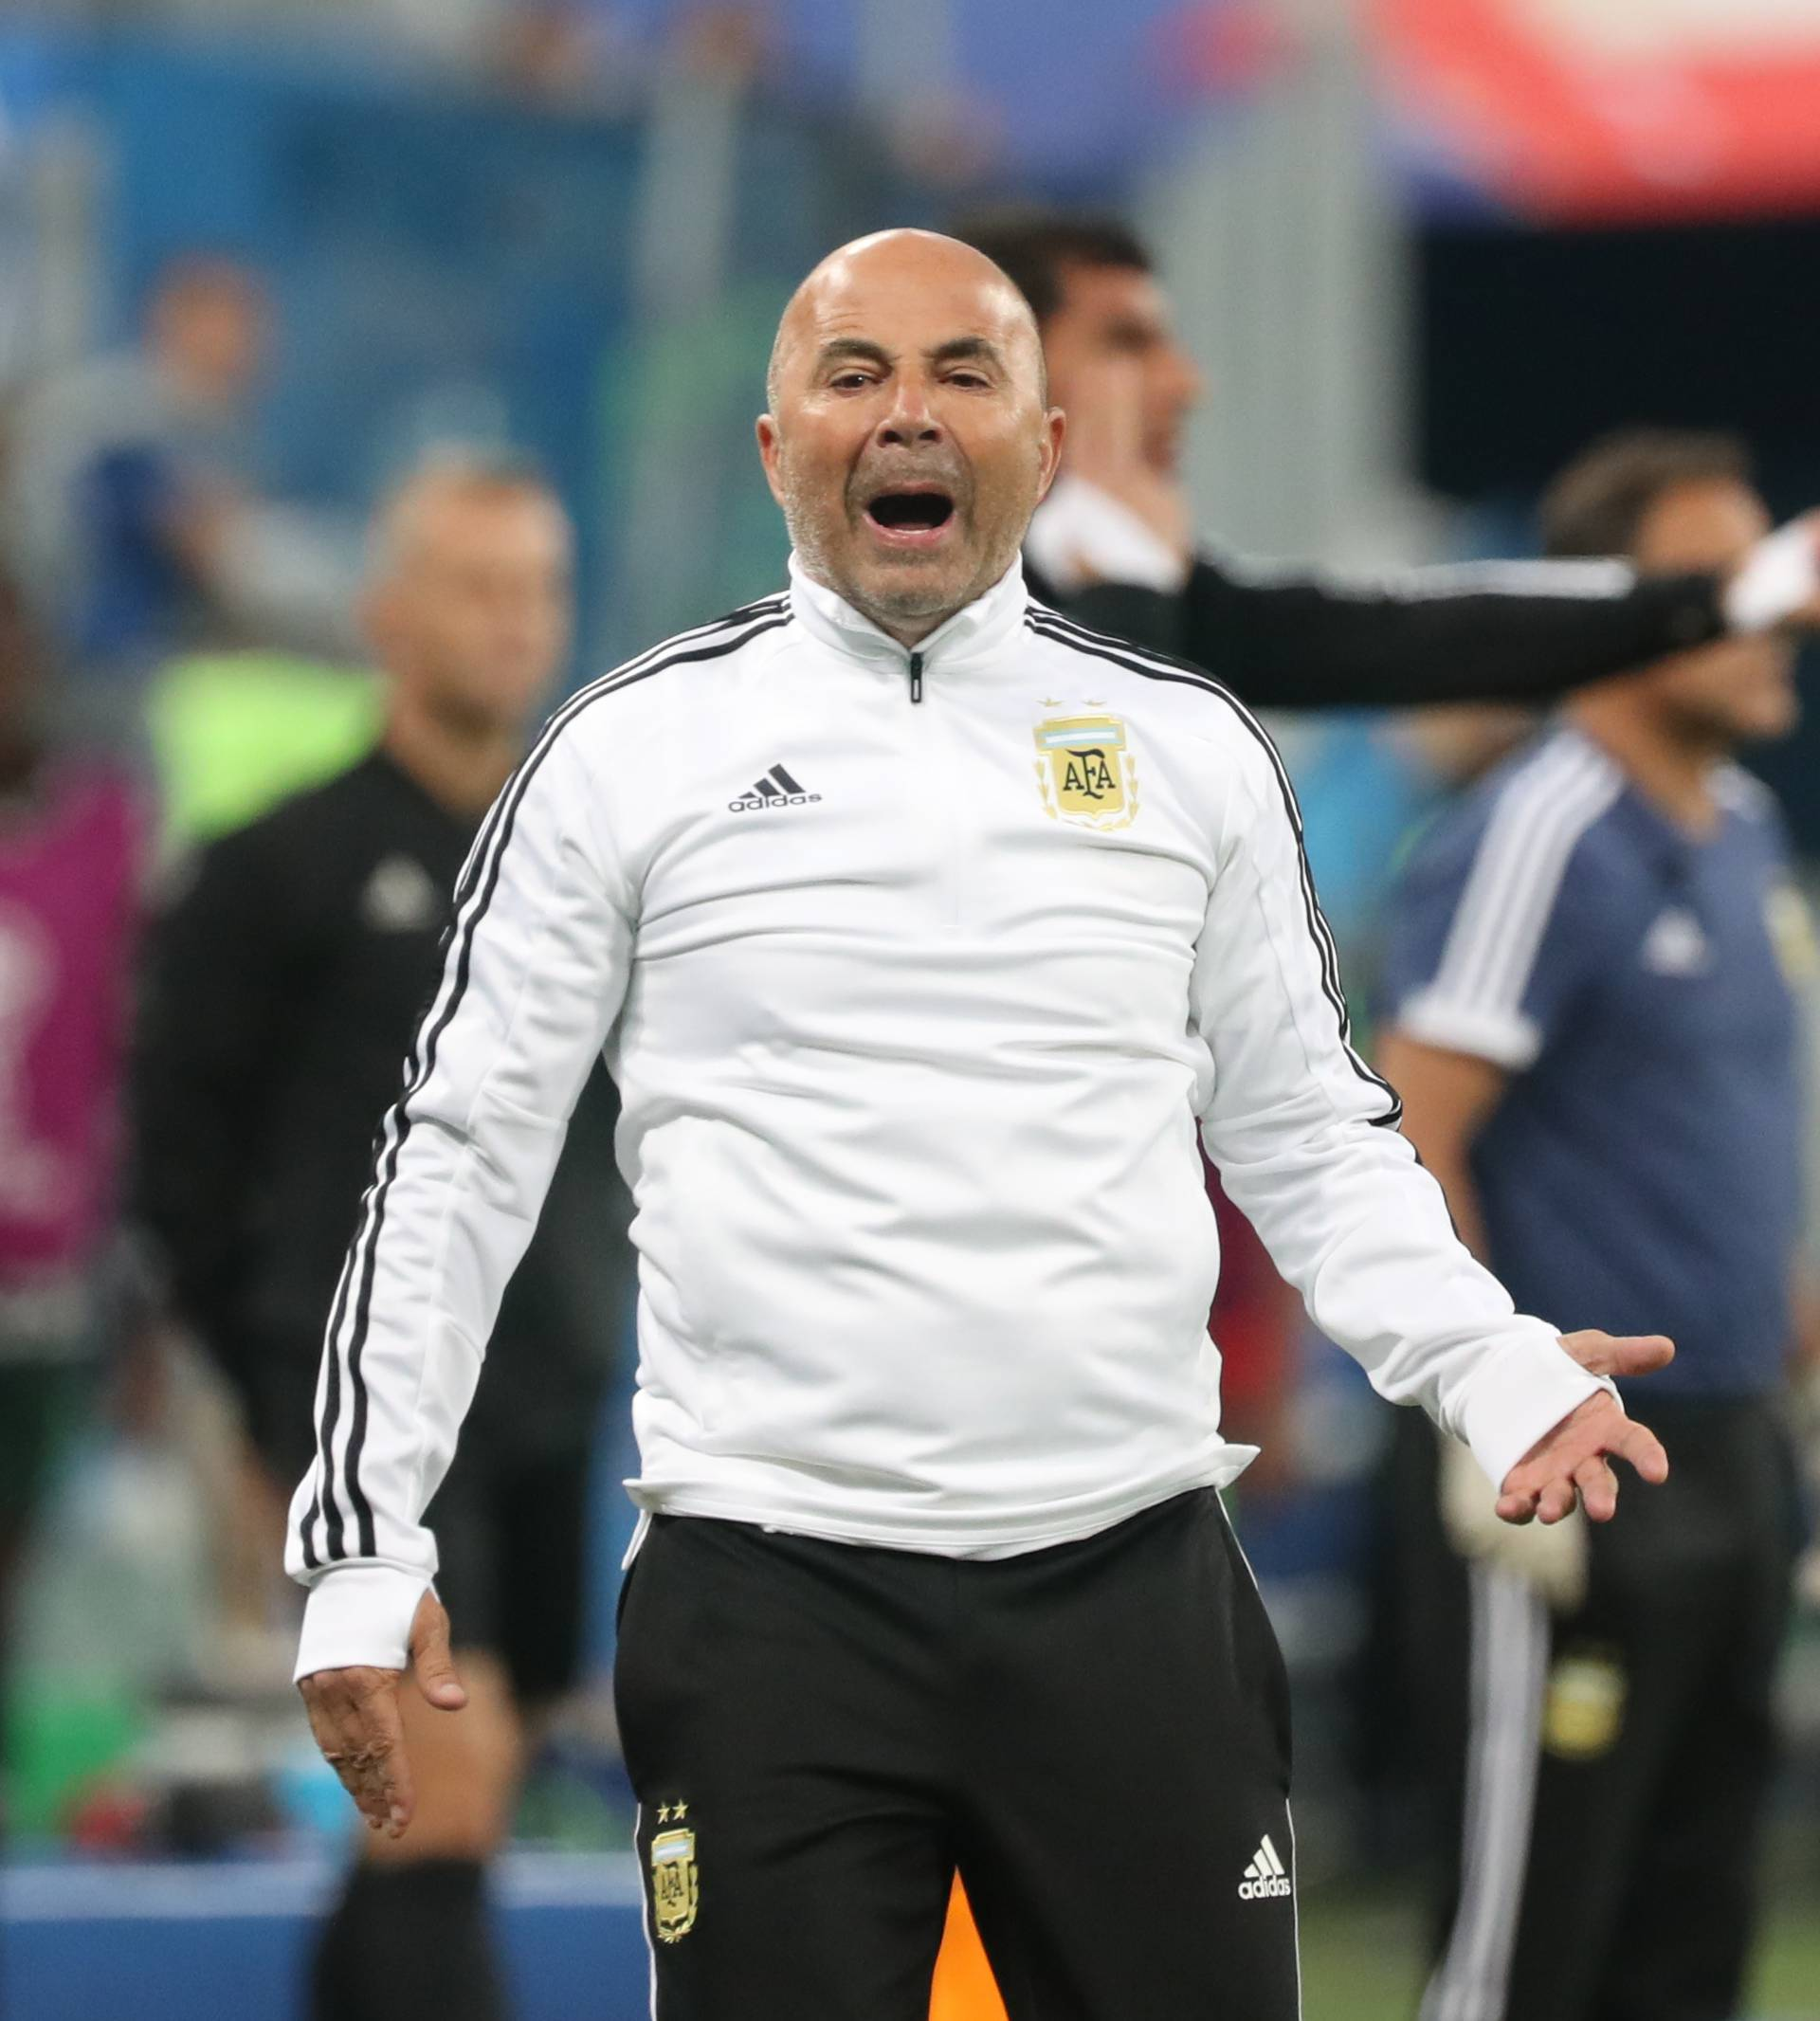 FIFA World Cup 2018 - Nigeria vs Argentina